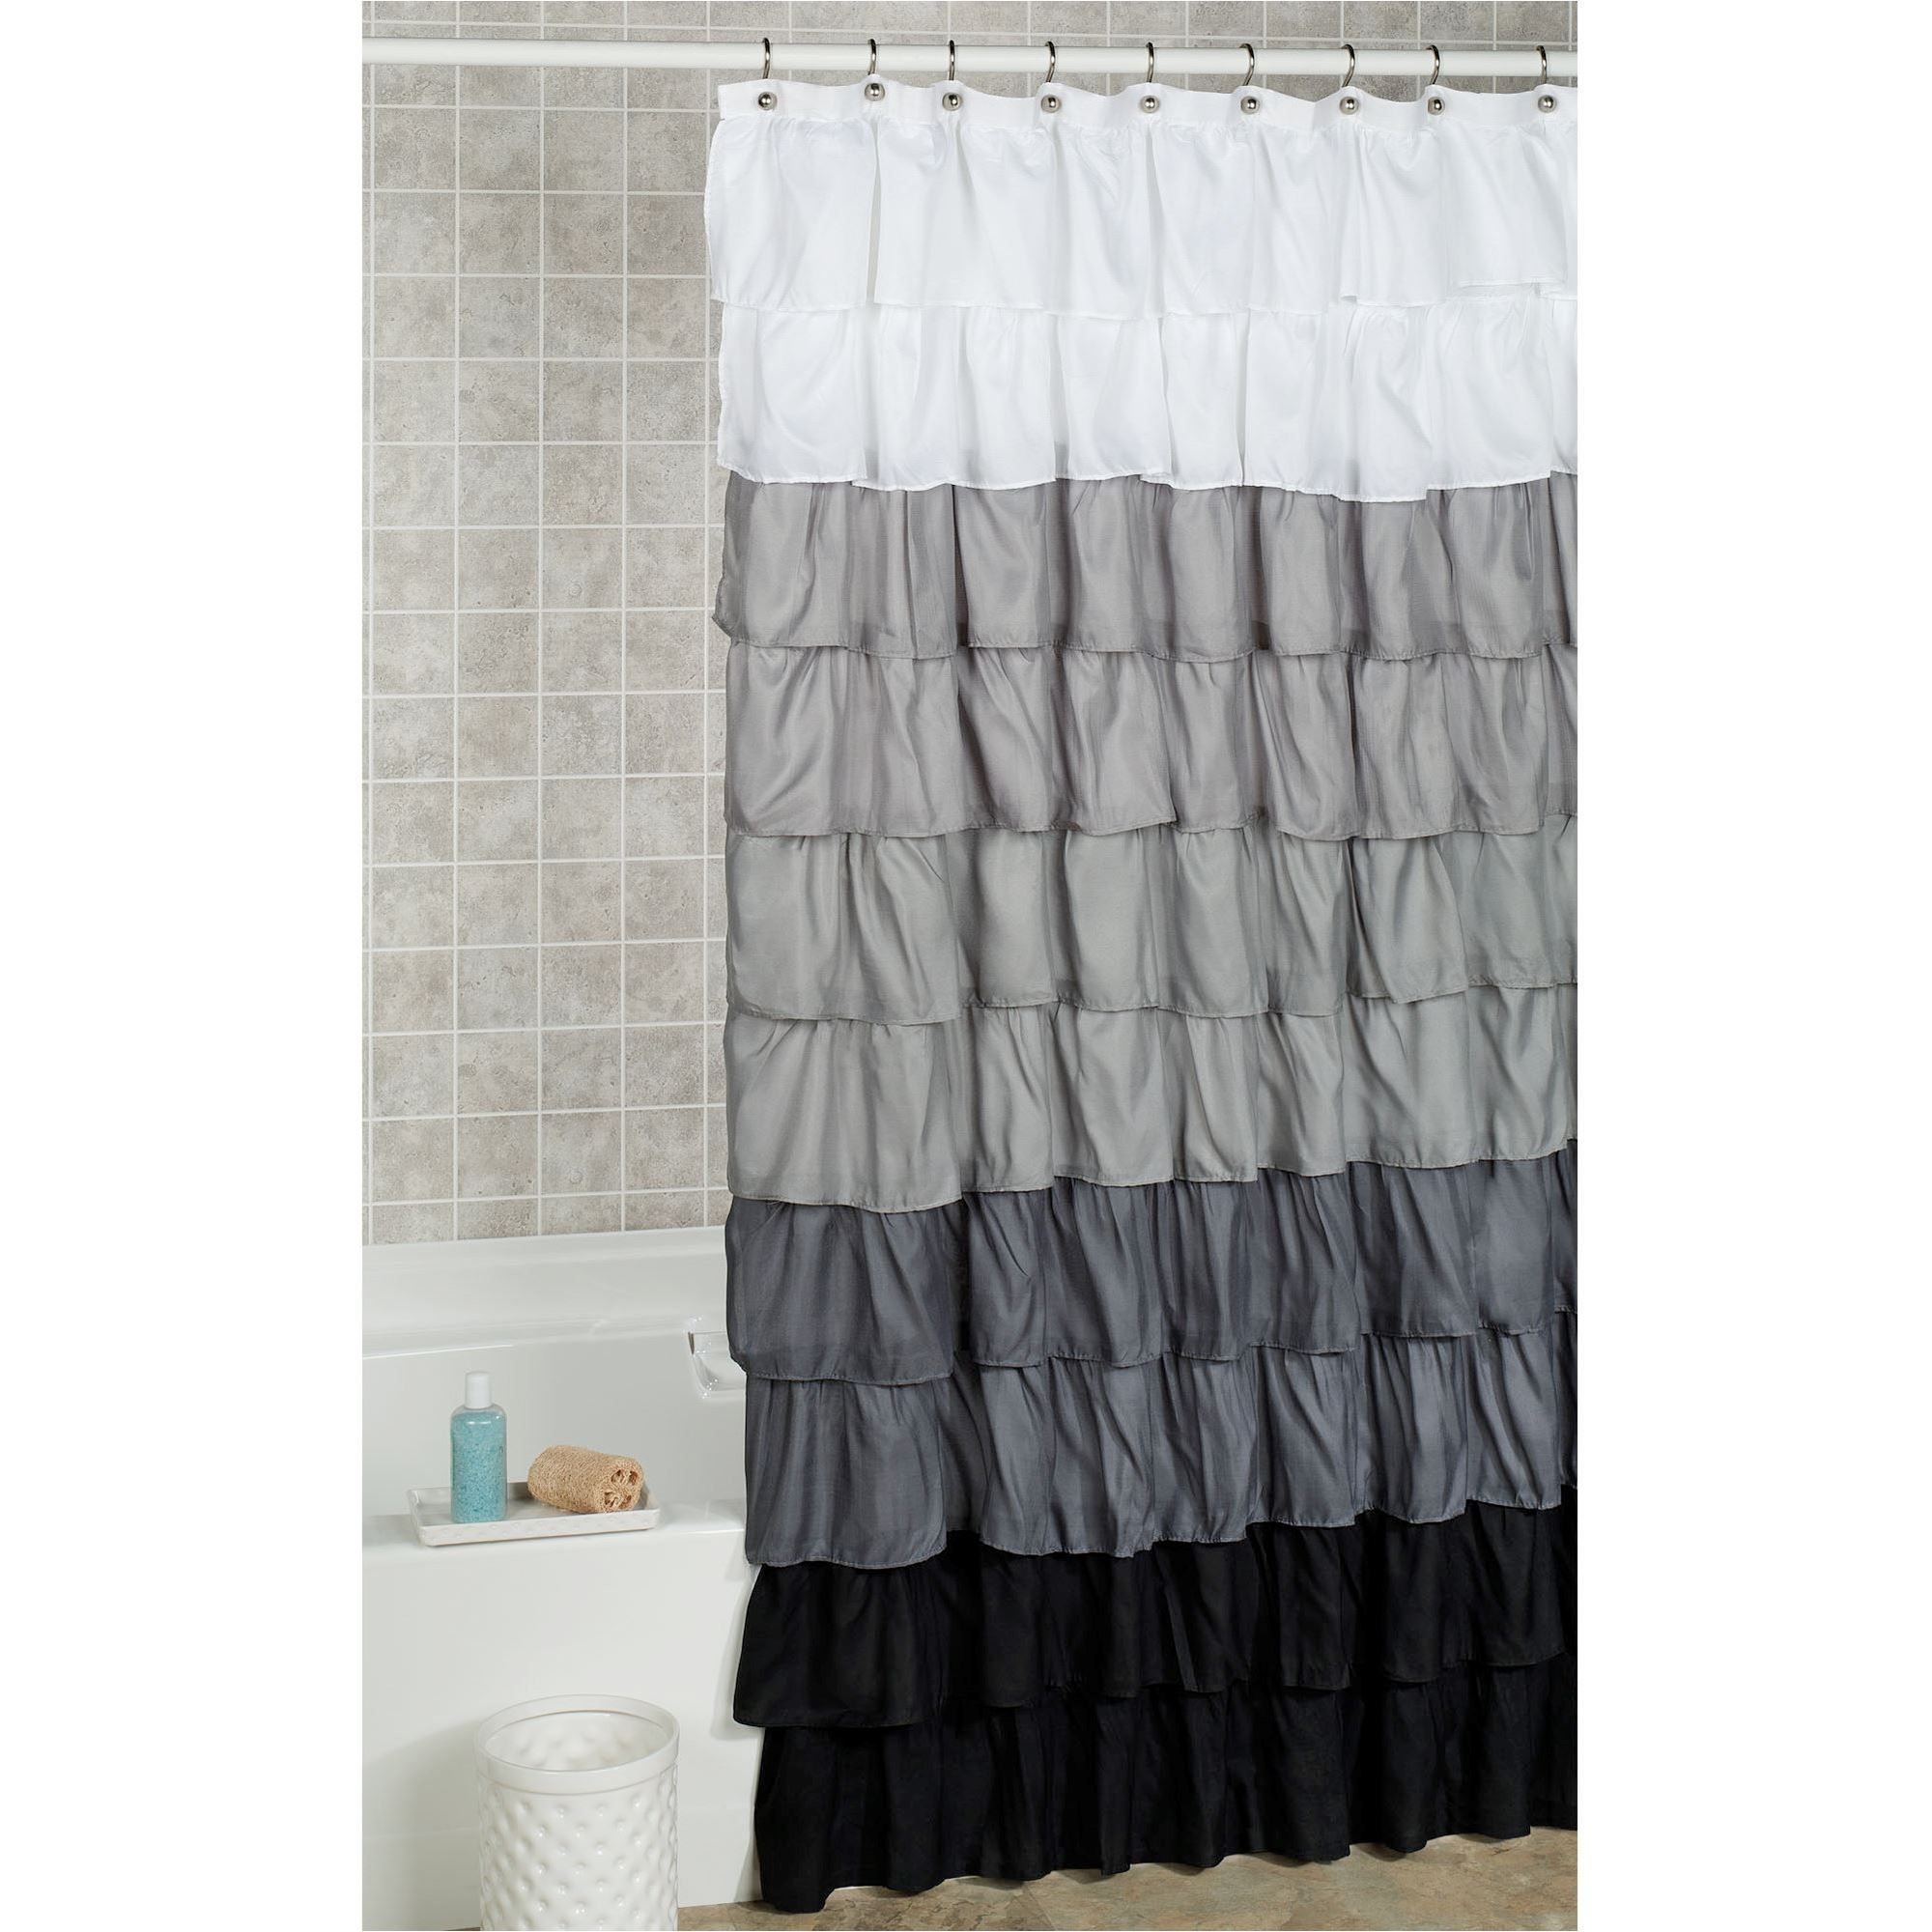 Grey Bathroom Ideas With Shower Curtain In 2020 Ruffle Shower